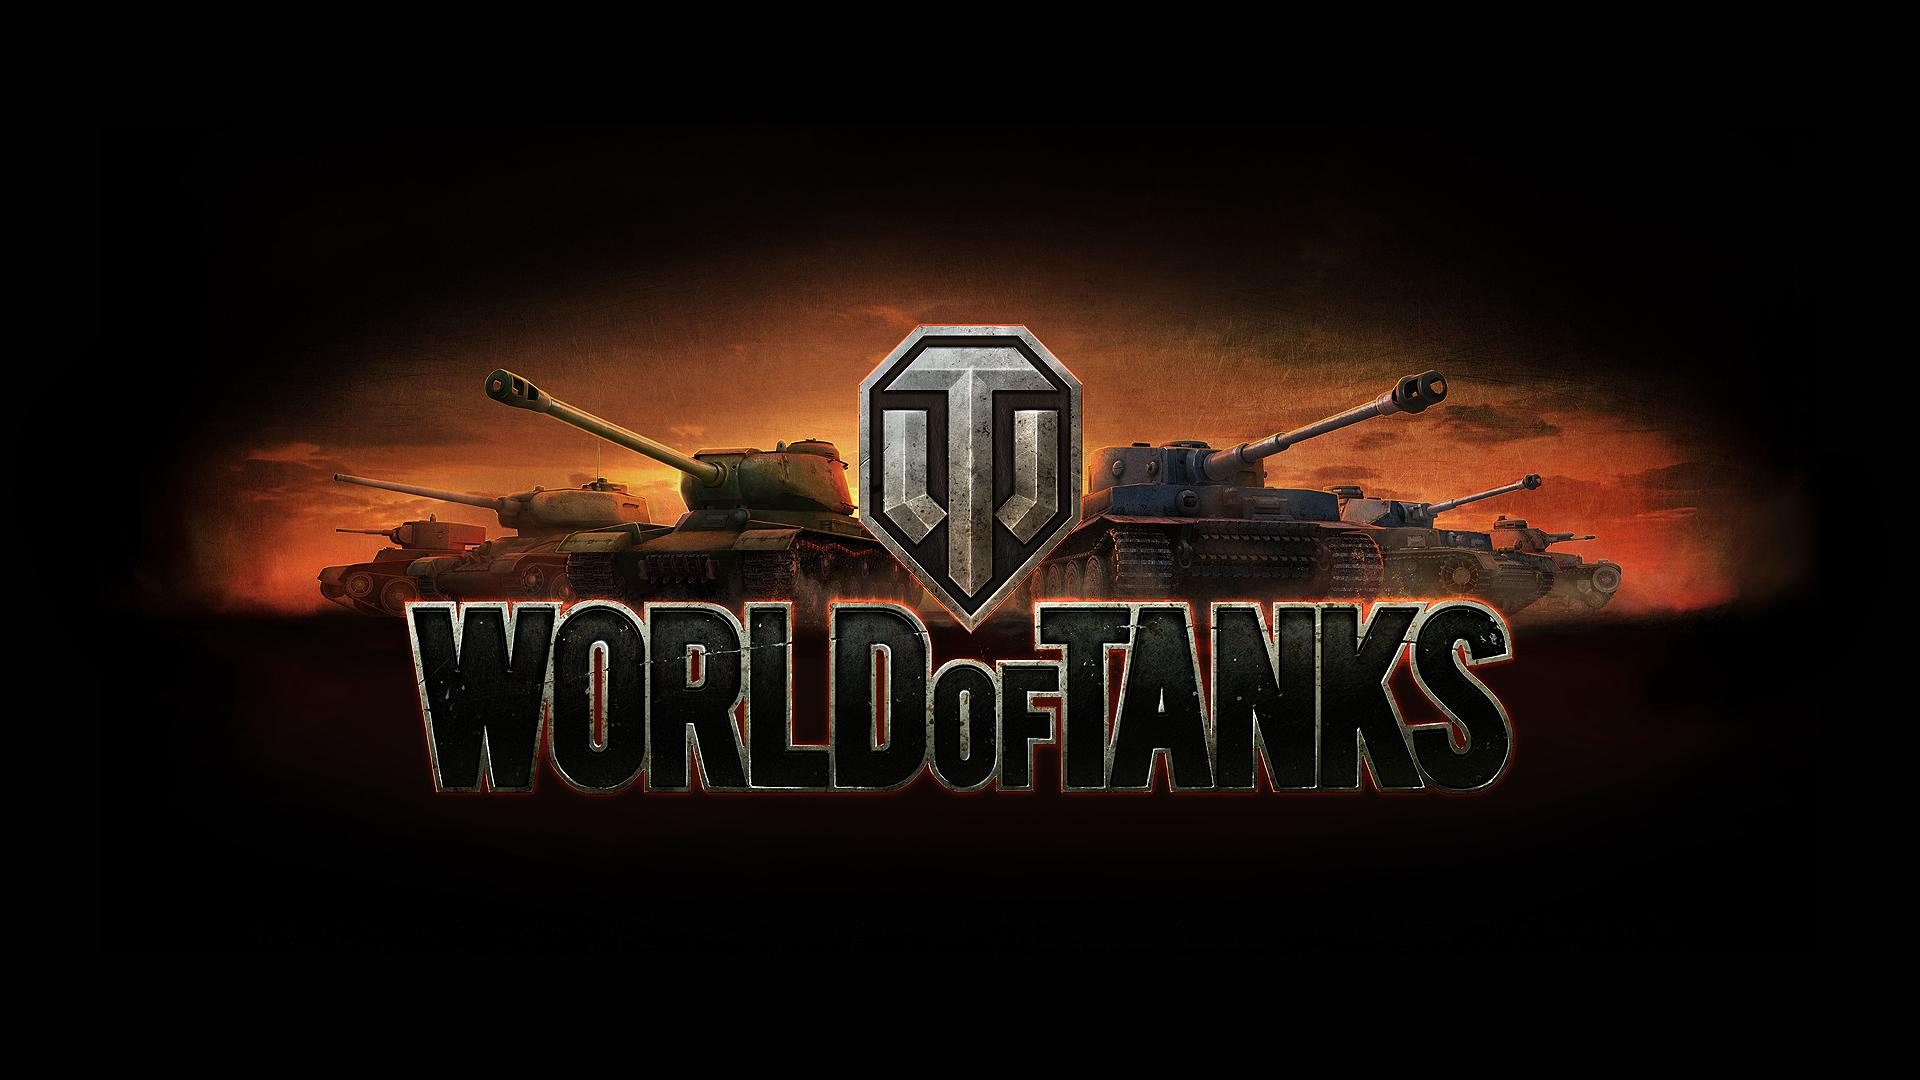 world of tanks logos download youtube logo vector white youtube logo vector 2017